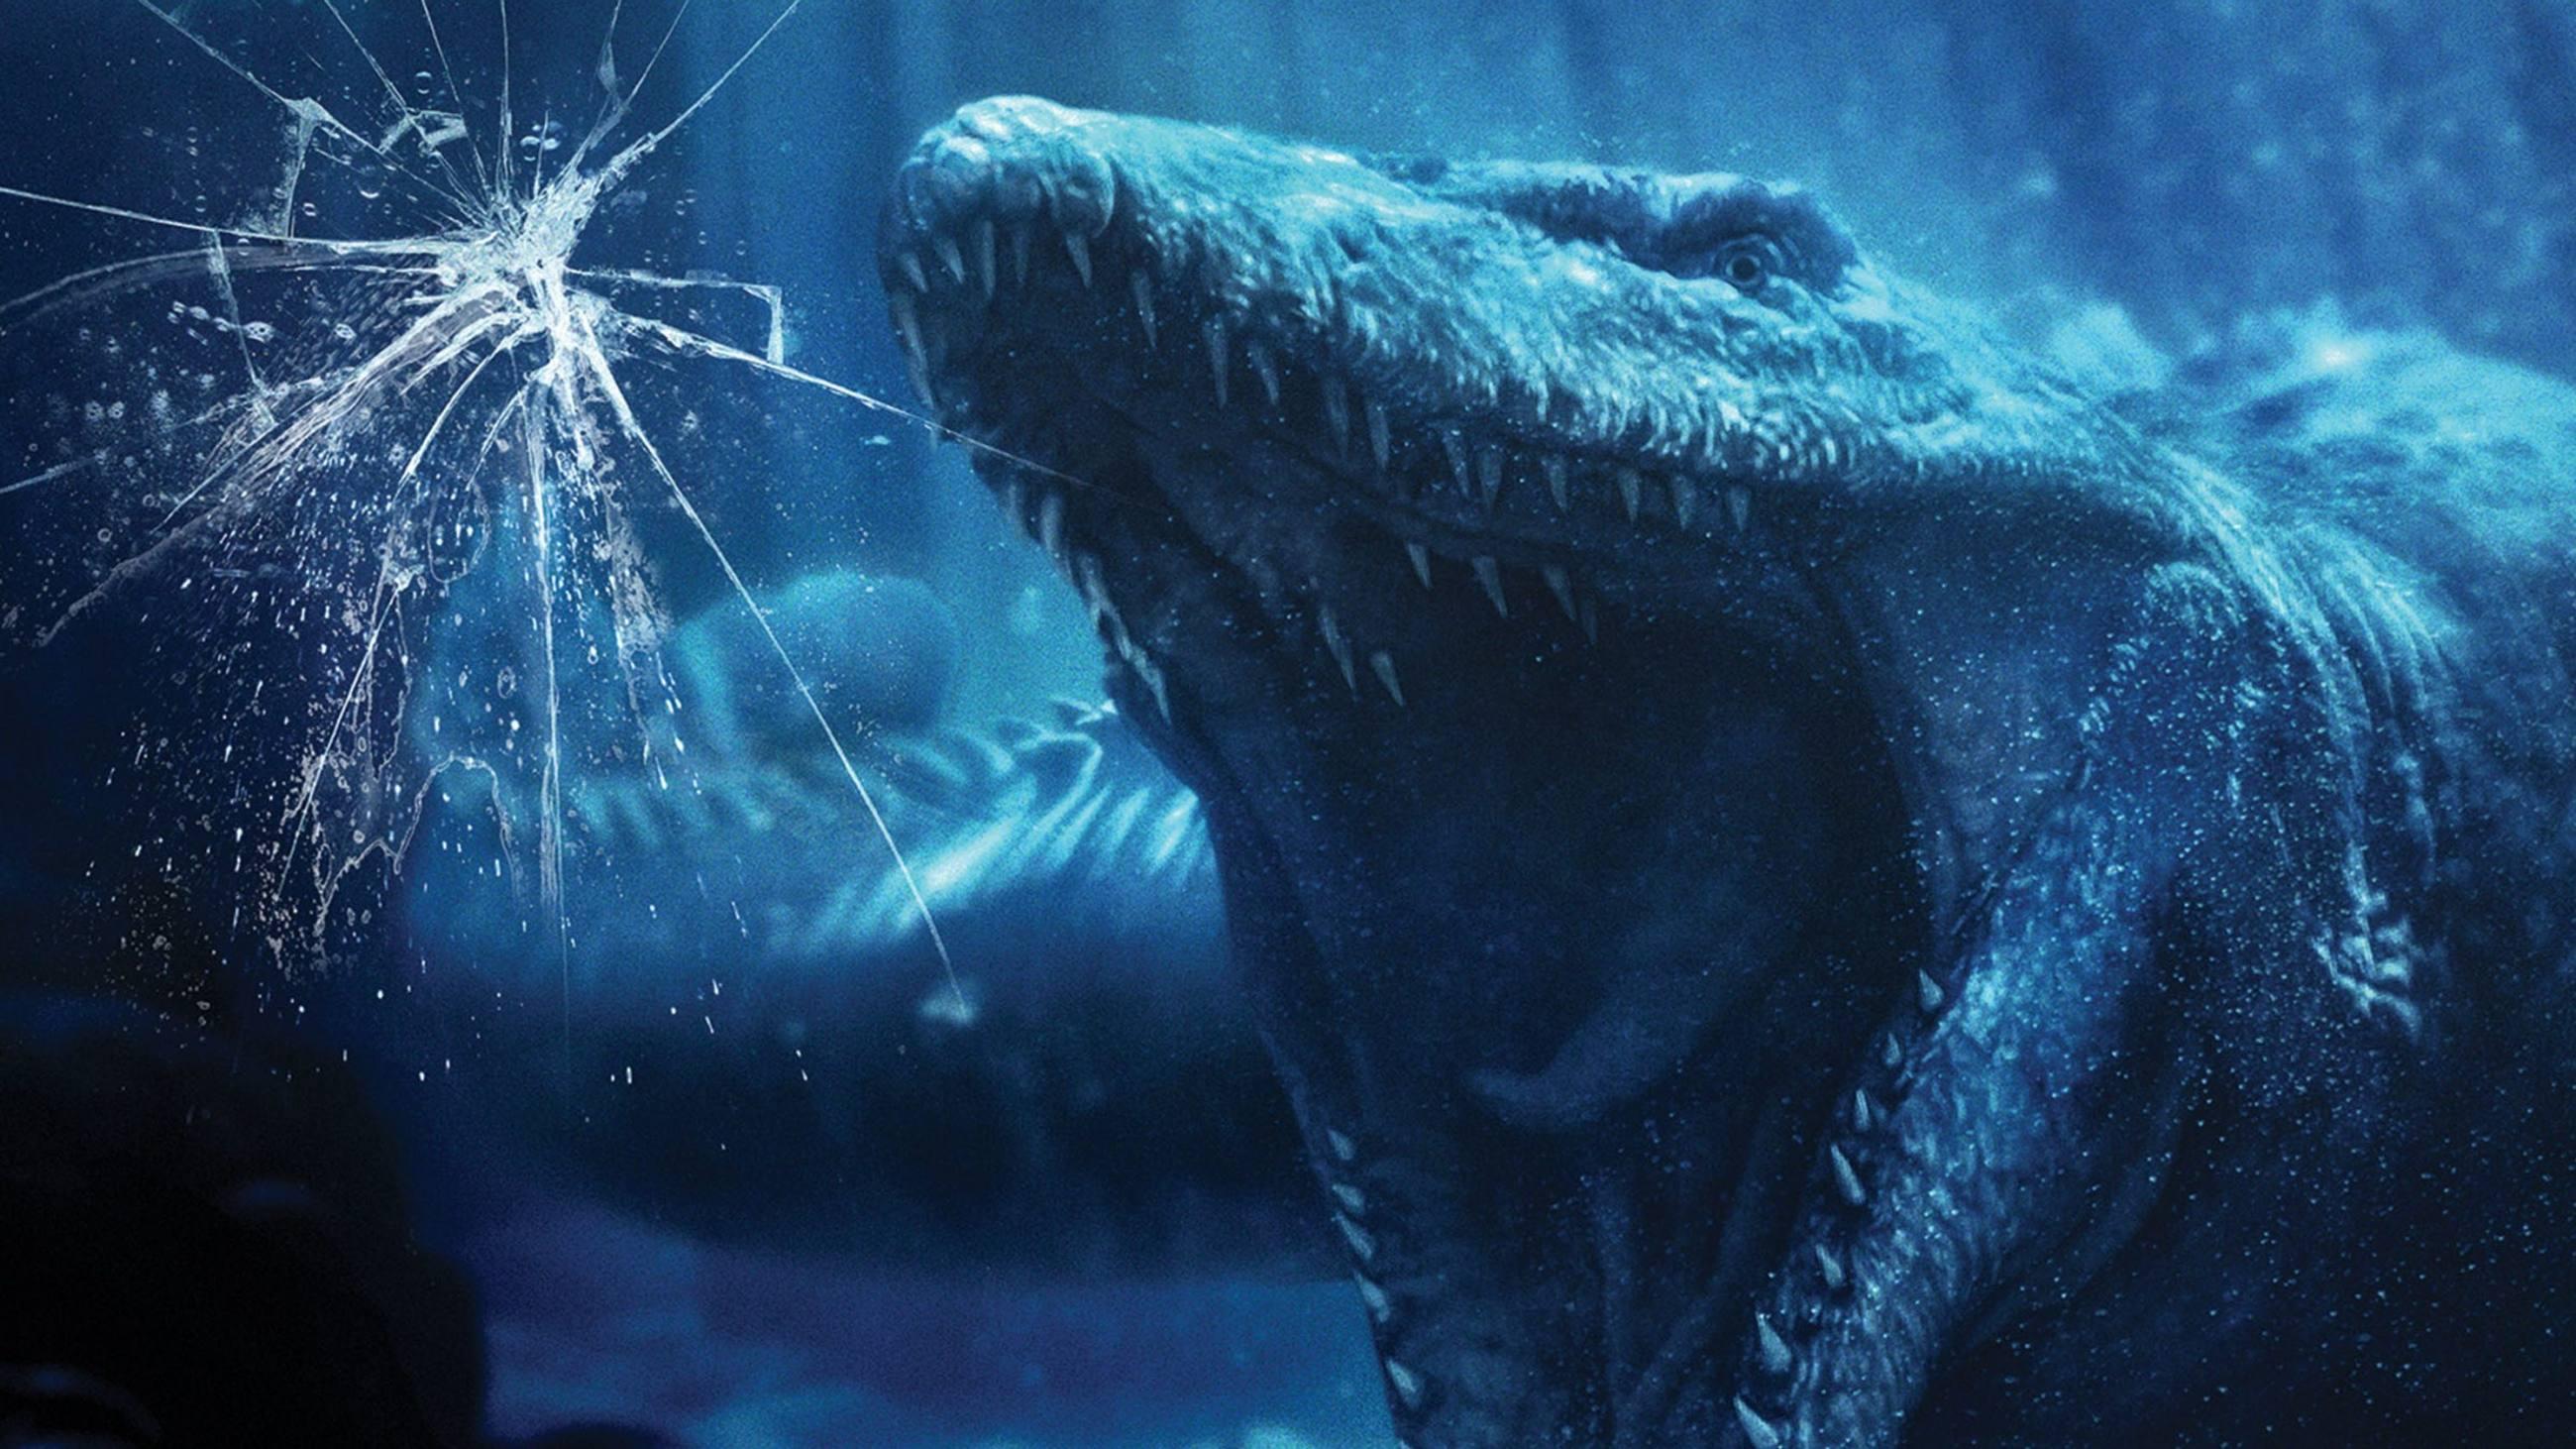 Mosasaurus attacks in Jurassic World: The Ride at Universal Studios Hollywood